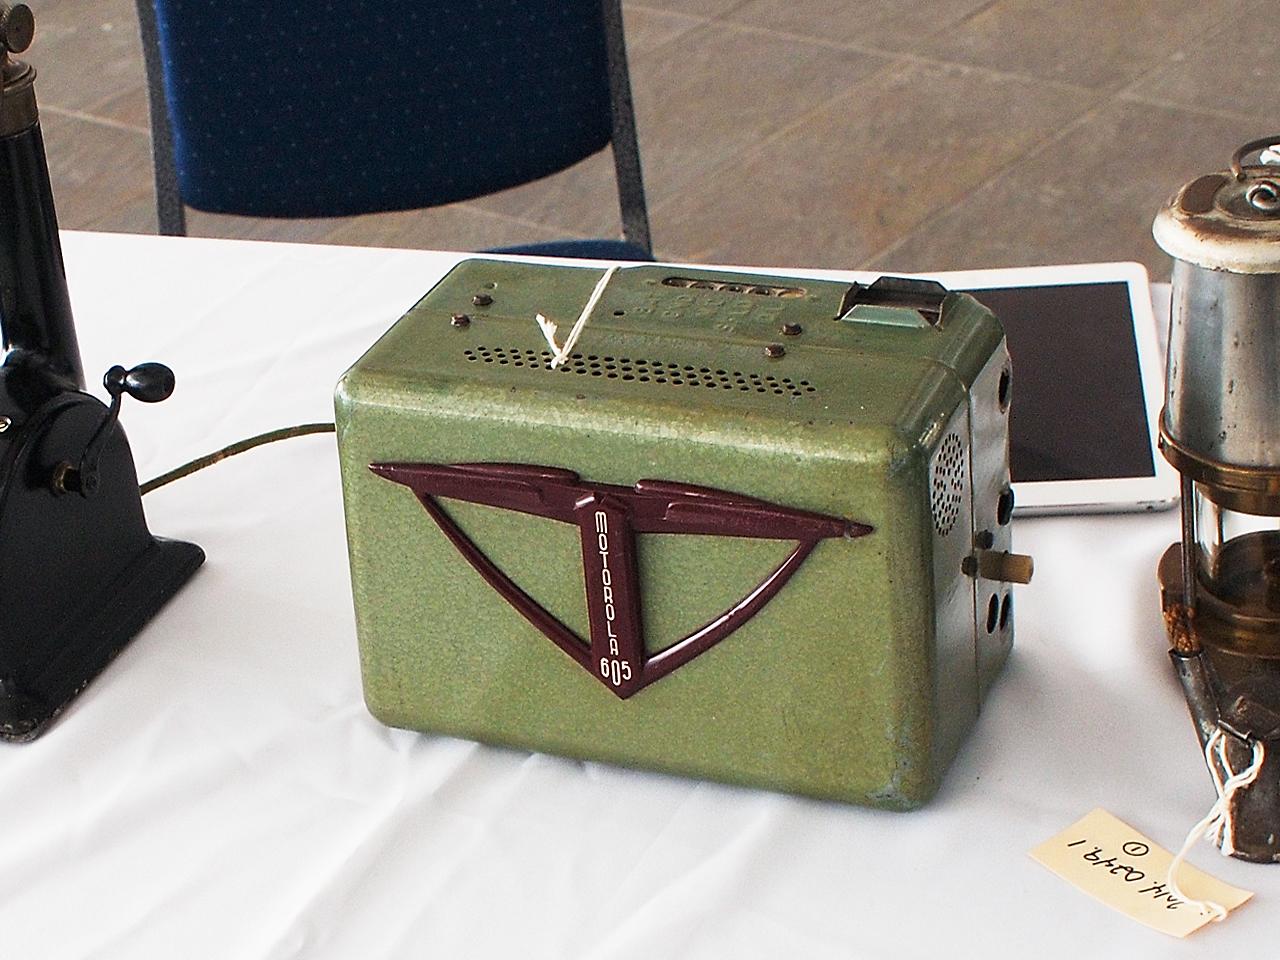 a green metal box